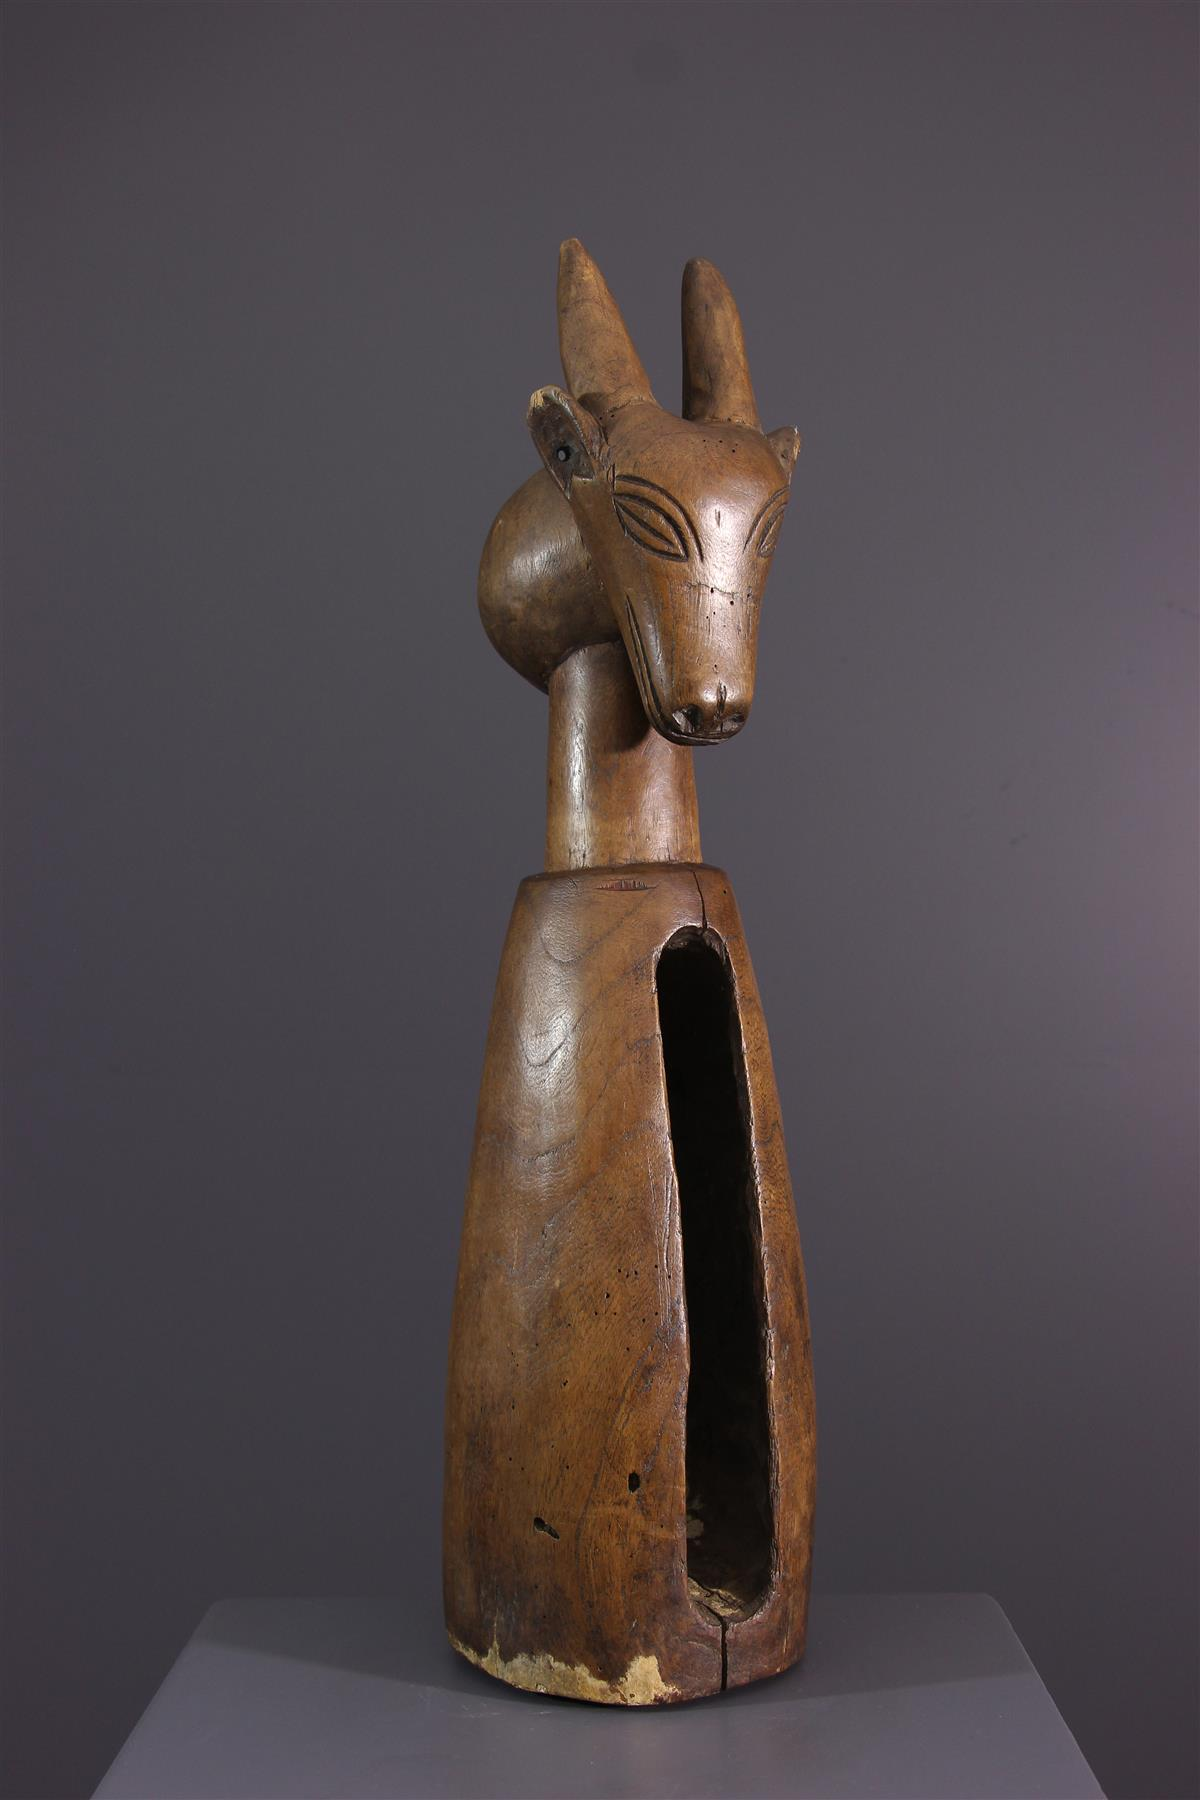 Suku Drum - Tribal art